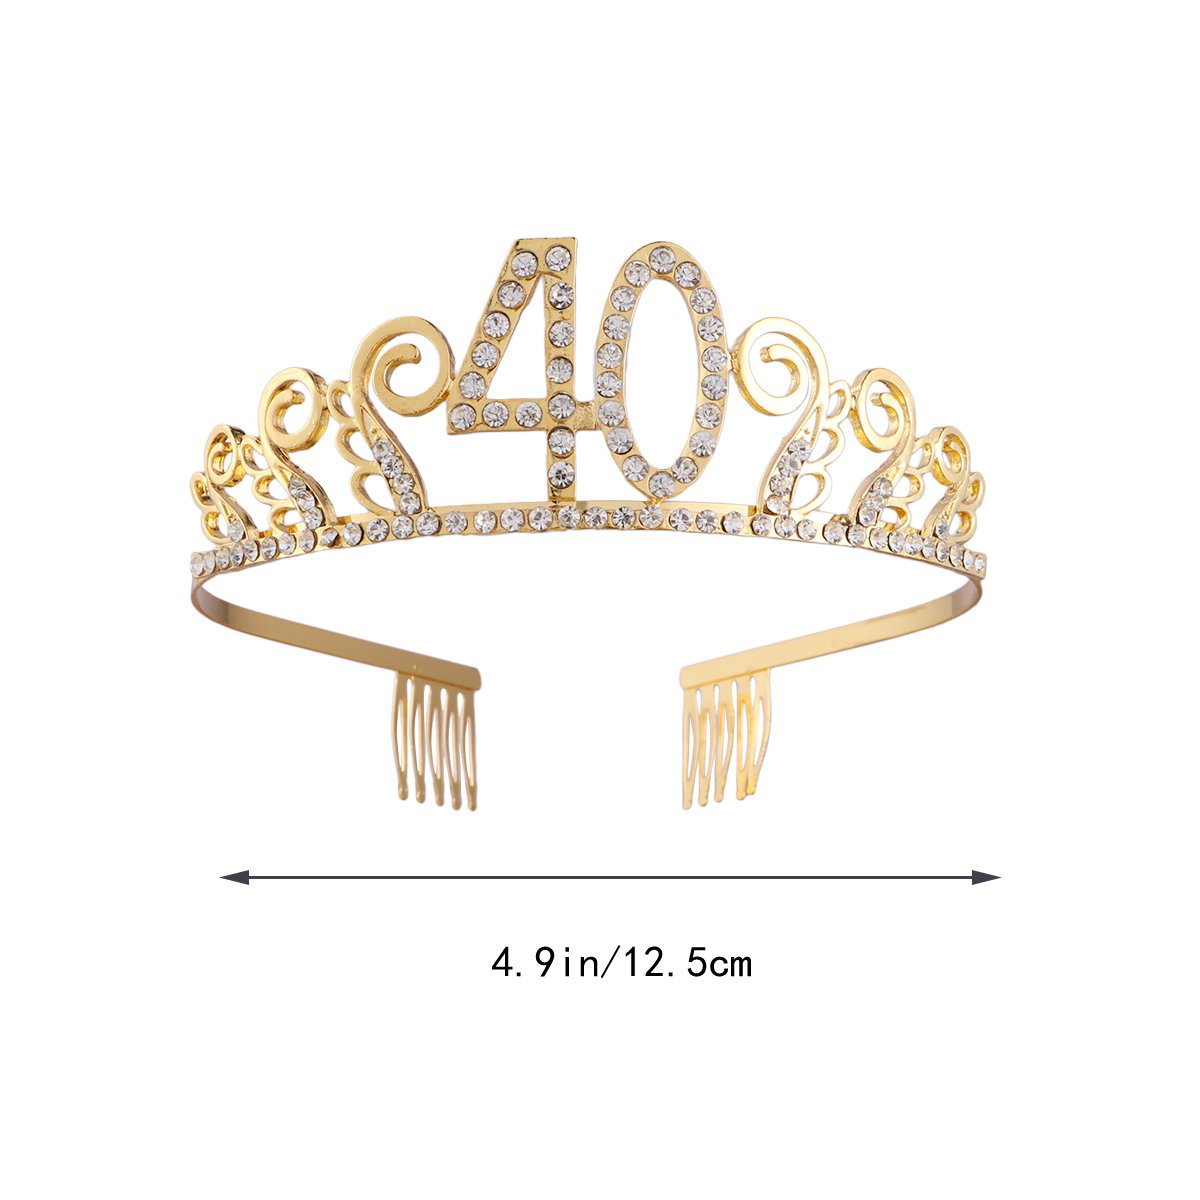 Cumpleaños Crystal Rhinestone Tiara Queen Princess Crowns ...